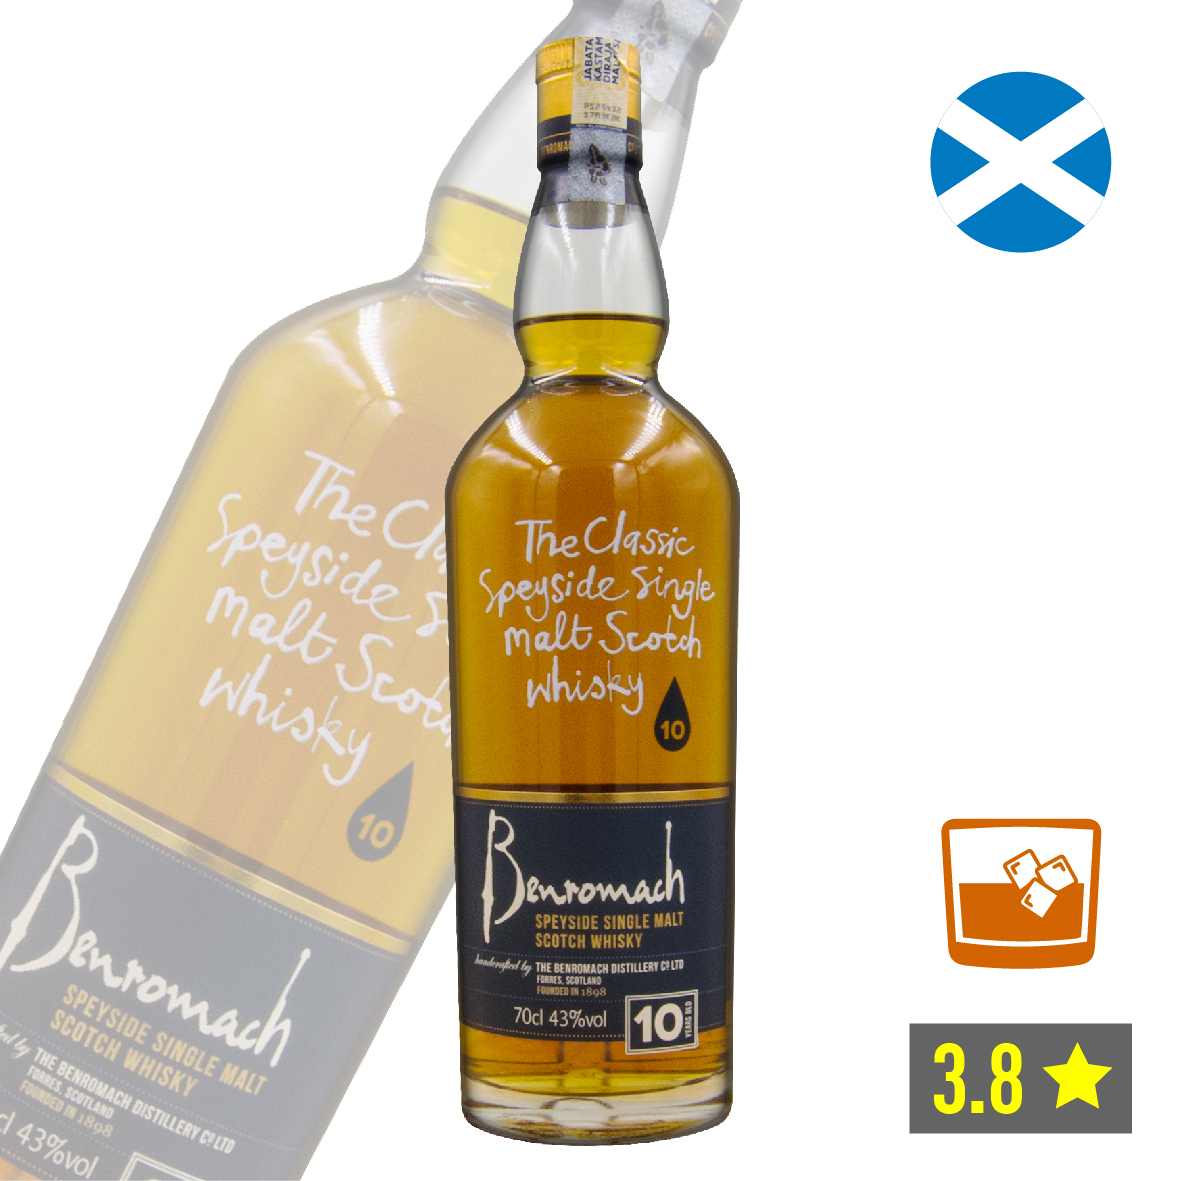 14-BENROMACH 10 YEAR(Scotland)-01.jpg